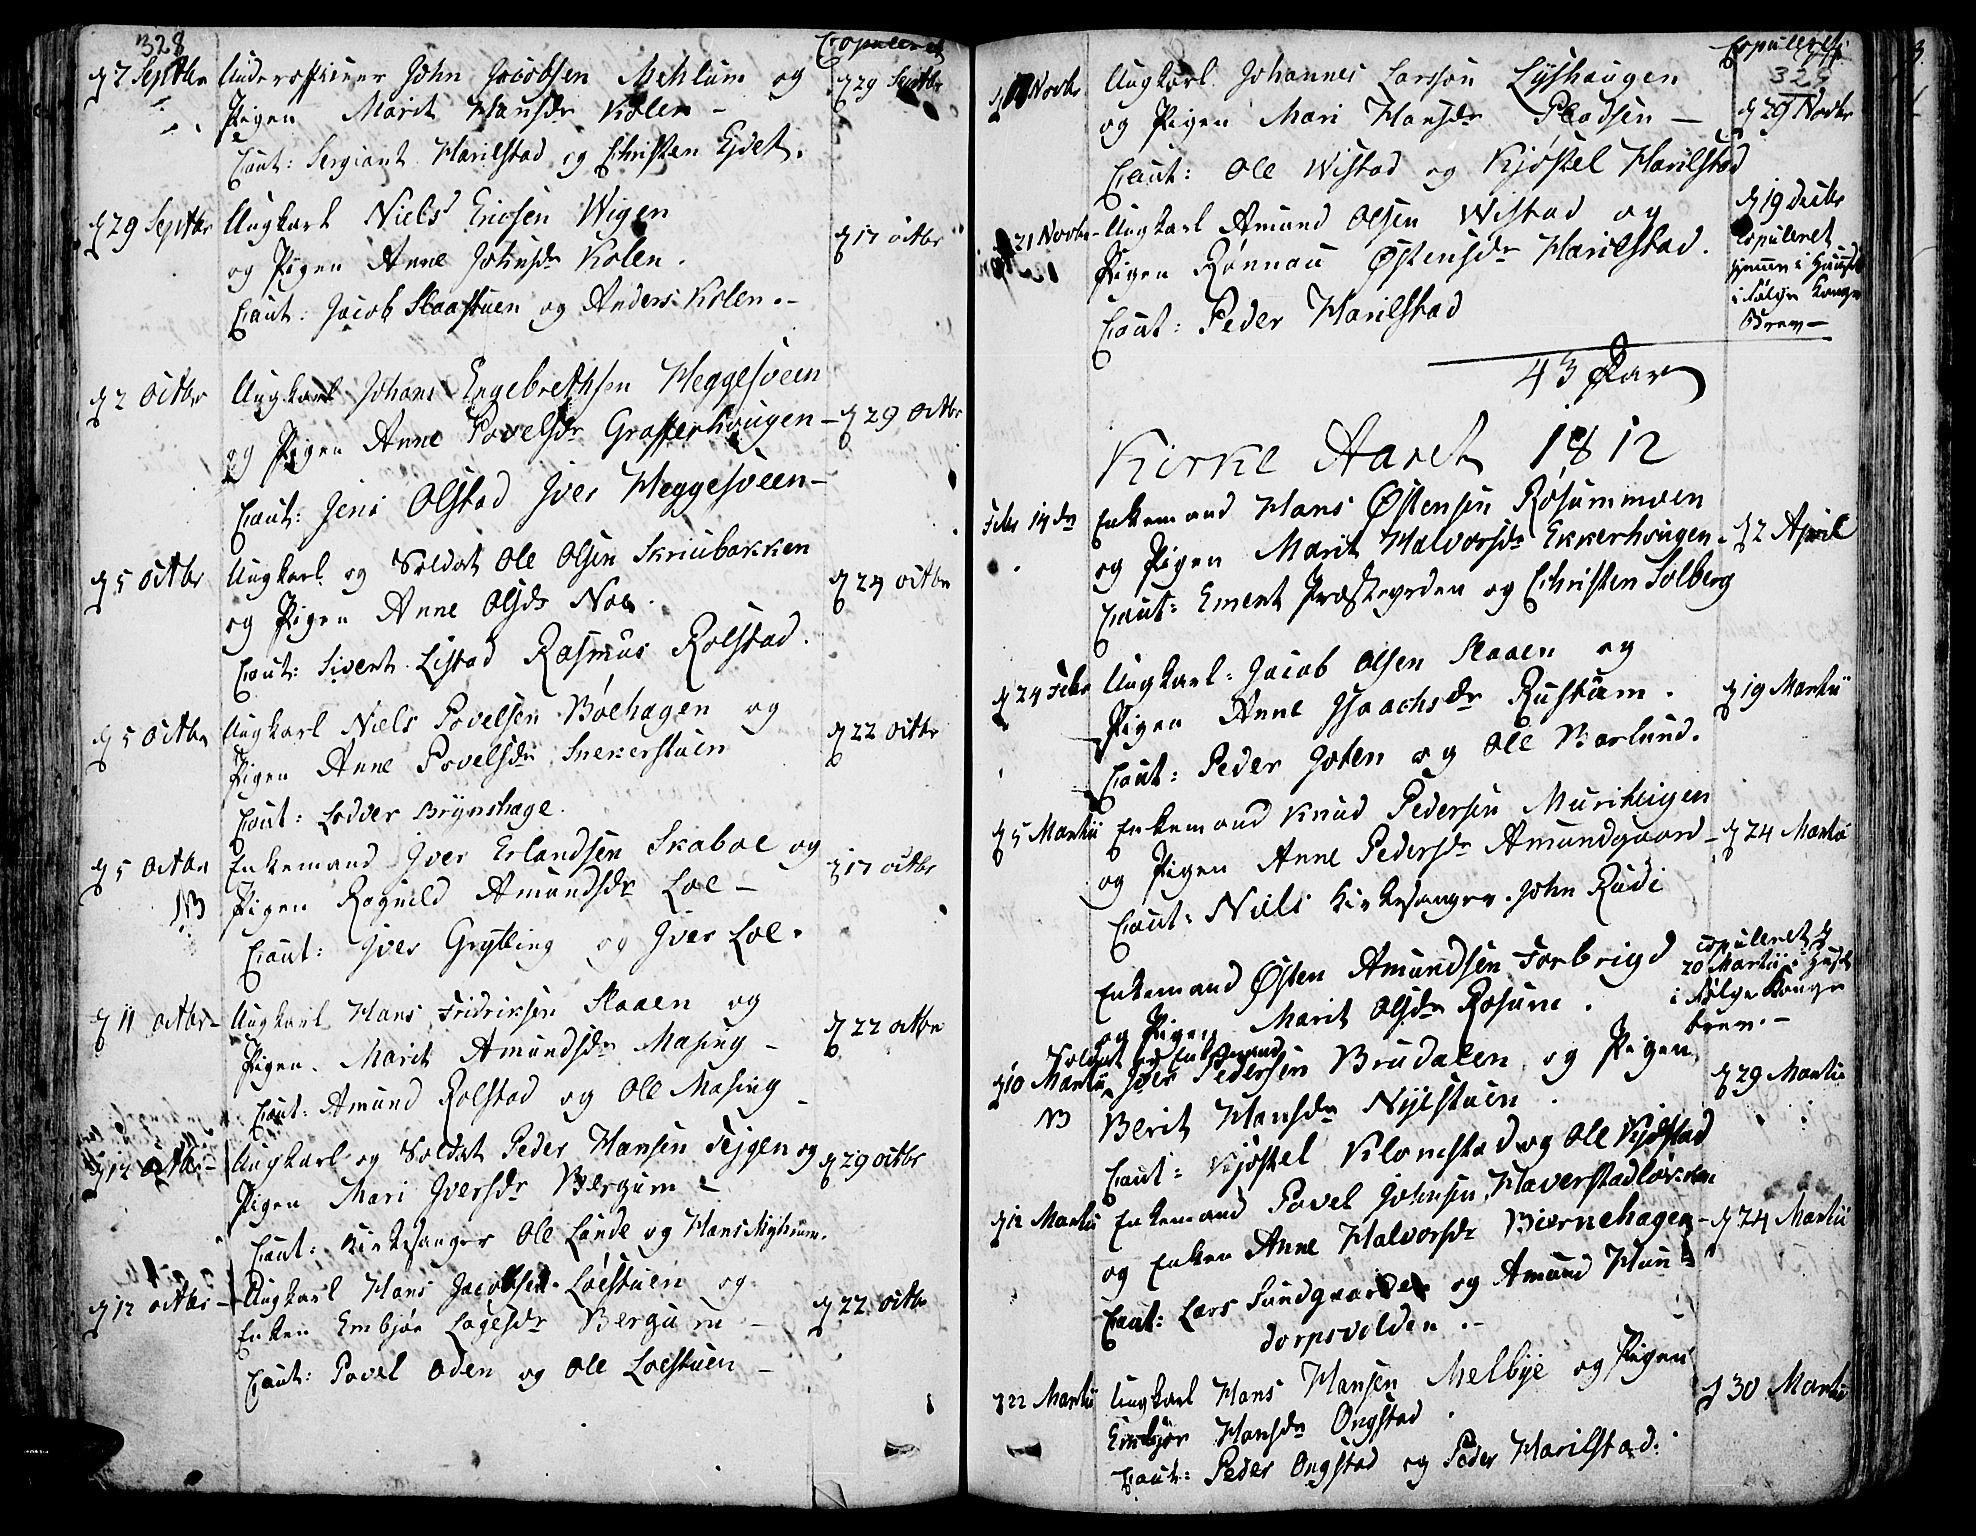 SAH, Fron prestekontor, H/Ha/Haa/L0001: Ministerialbok nr. 1, 1799-1816, s. 328-329